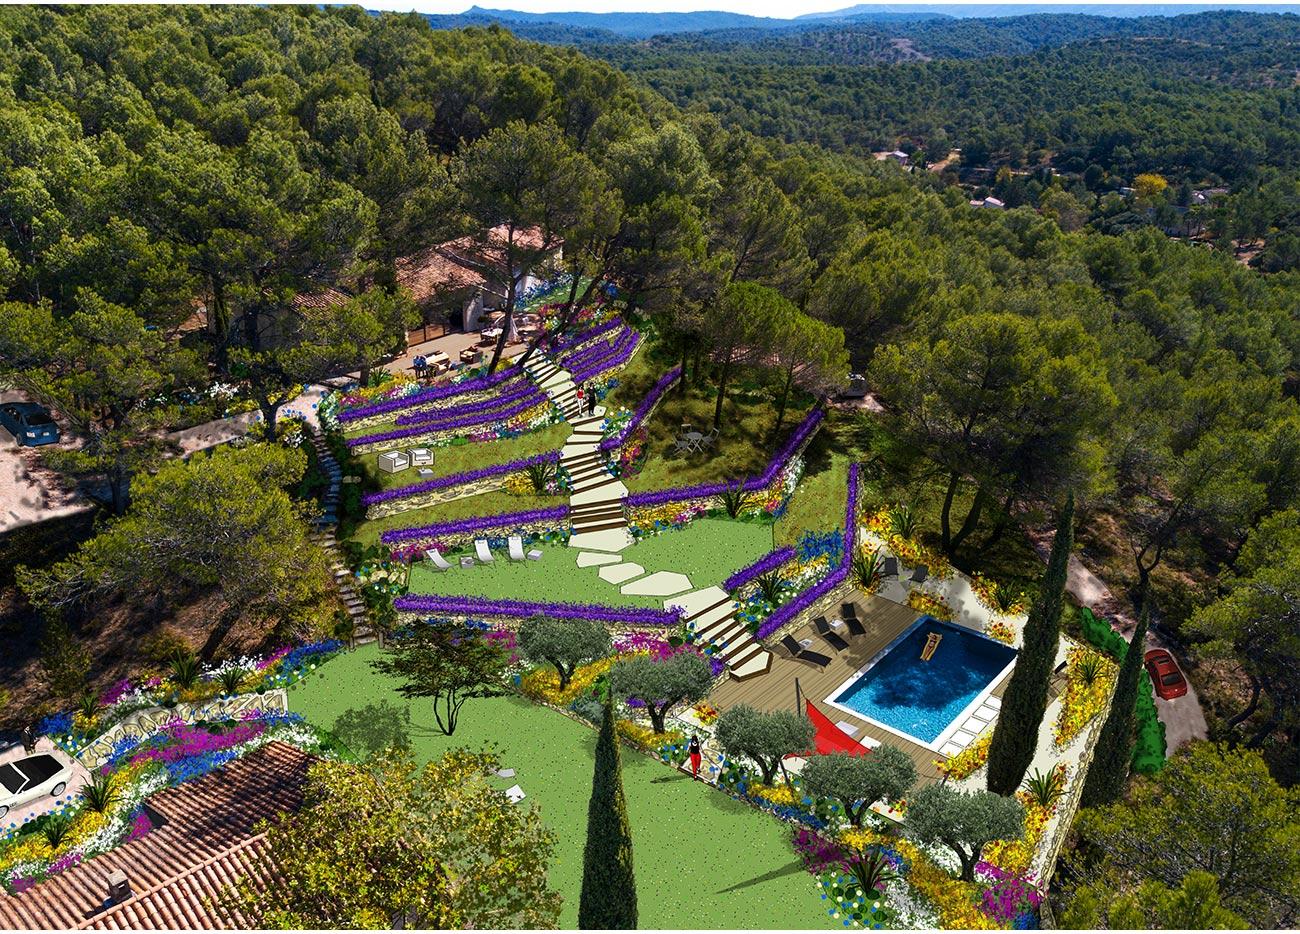 Vue aérienne jardin méditerrannéen - Paysagiste Montpellier